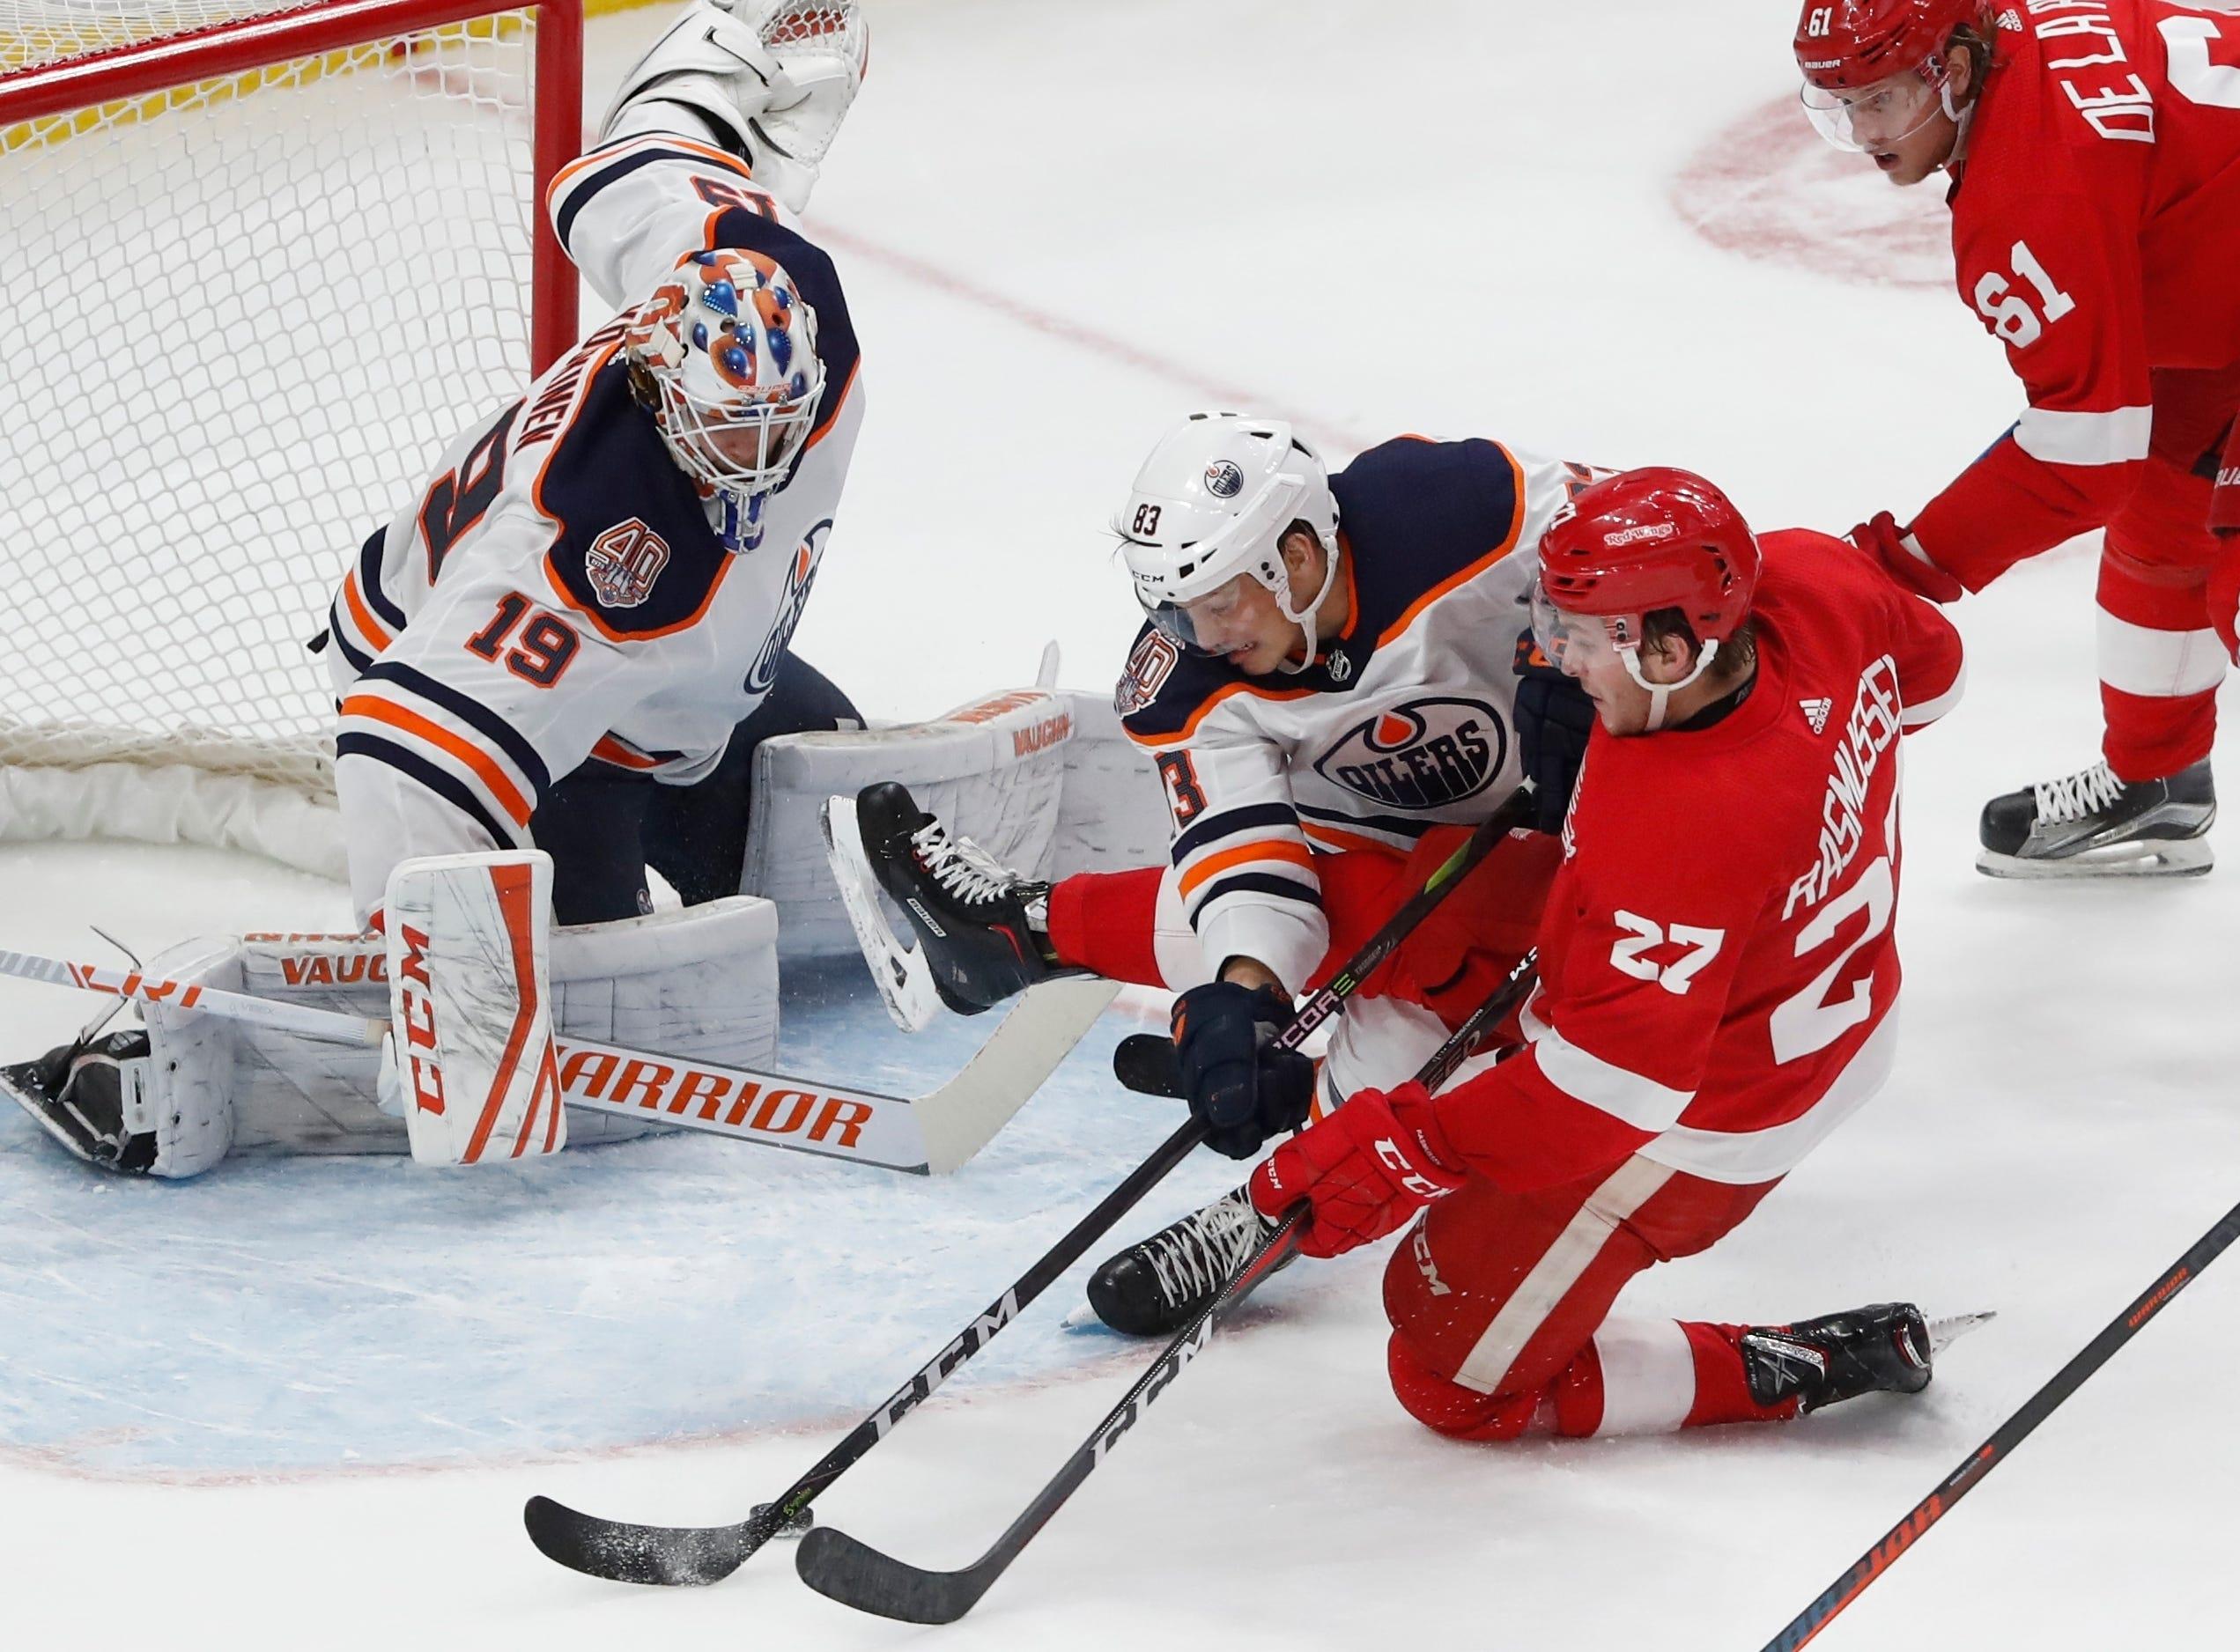 Edmonton Oilers defenseman Matt Benning (83) deflects the puck away from Detroit Red Wings center Michael Rasmussen (27) in front of goaltender Mikko Koskinen (19) during the third period of an NHL hockey game, Saturday, Nov. 3, 2018, in Detroit. Edmonton won, 4-3. (AP Photo/Carlos Osorio)